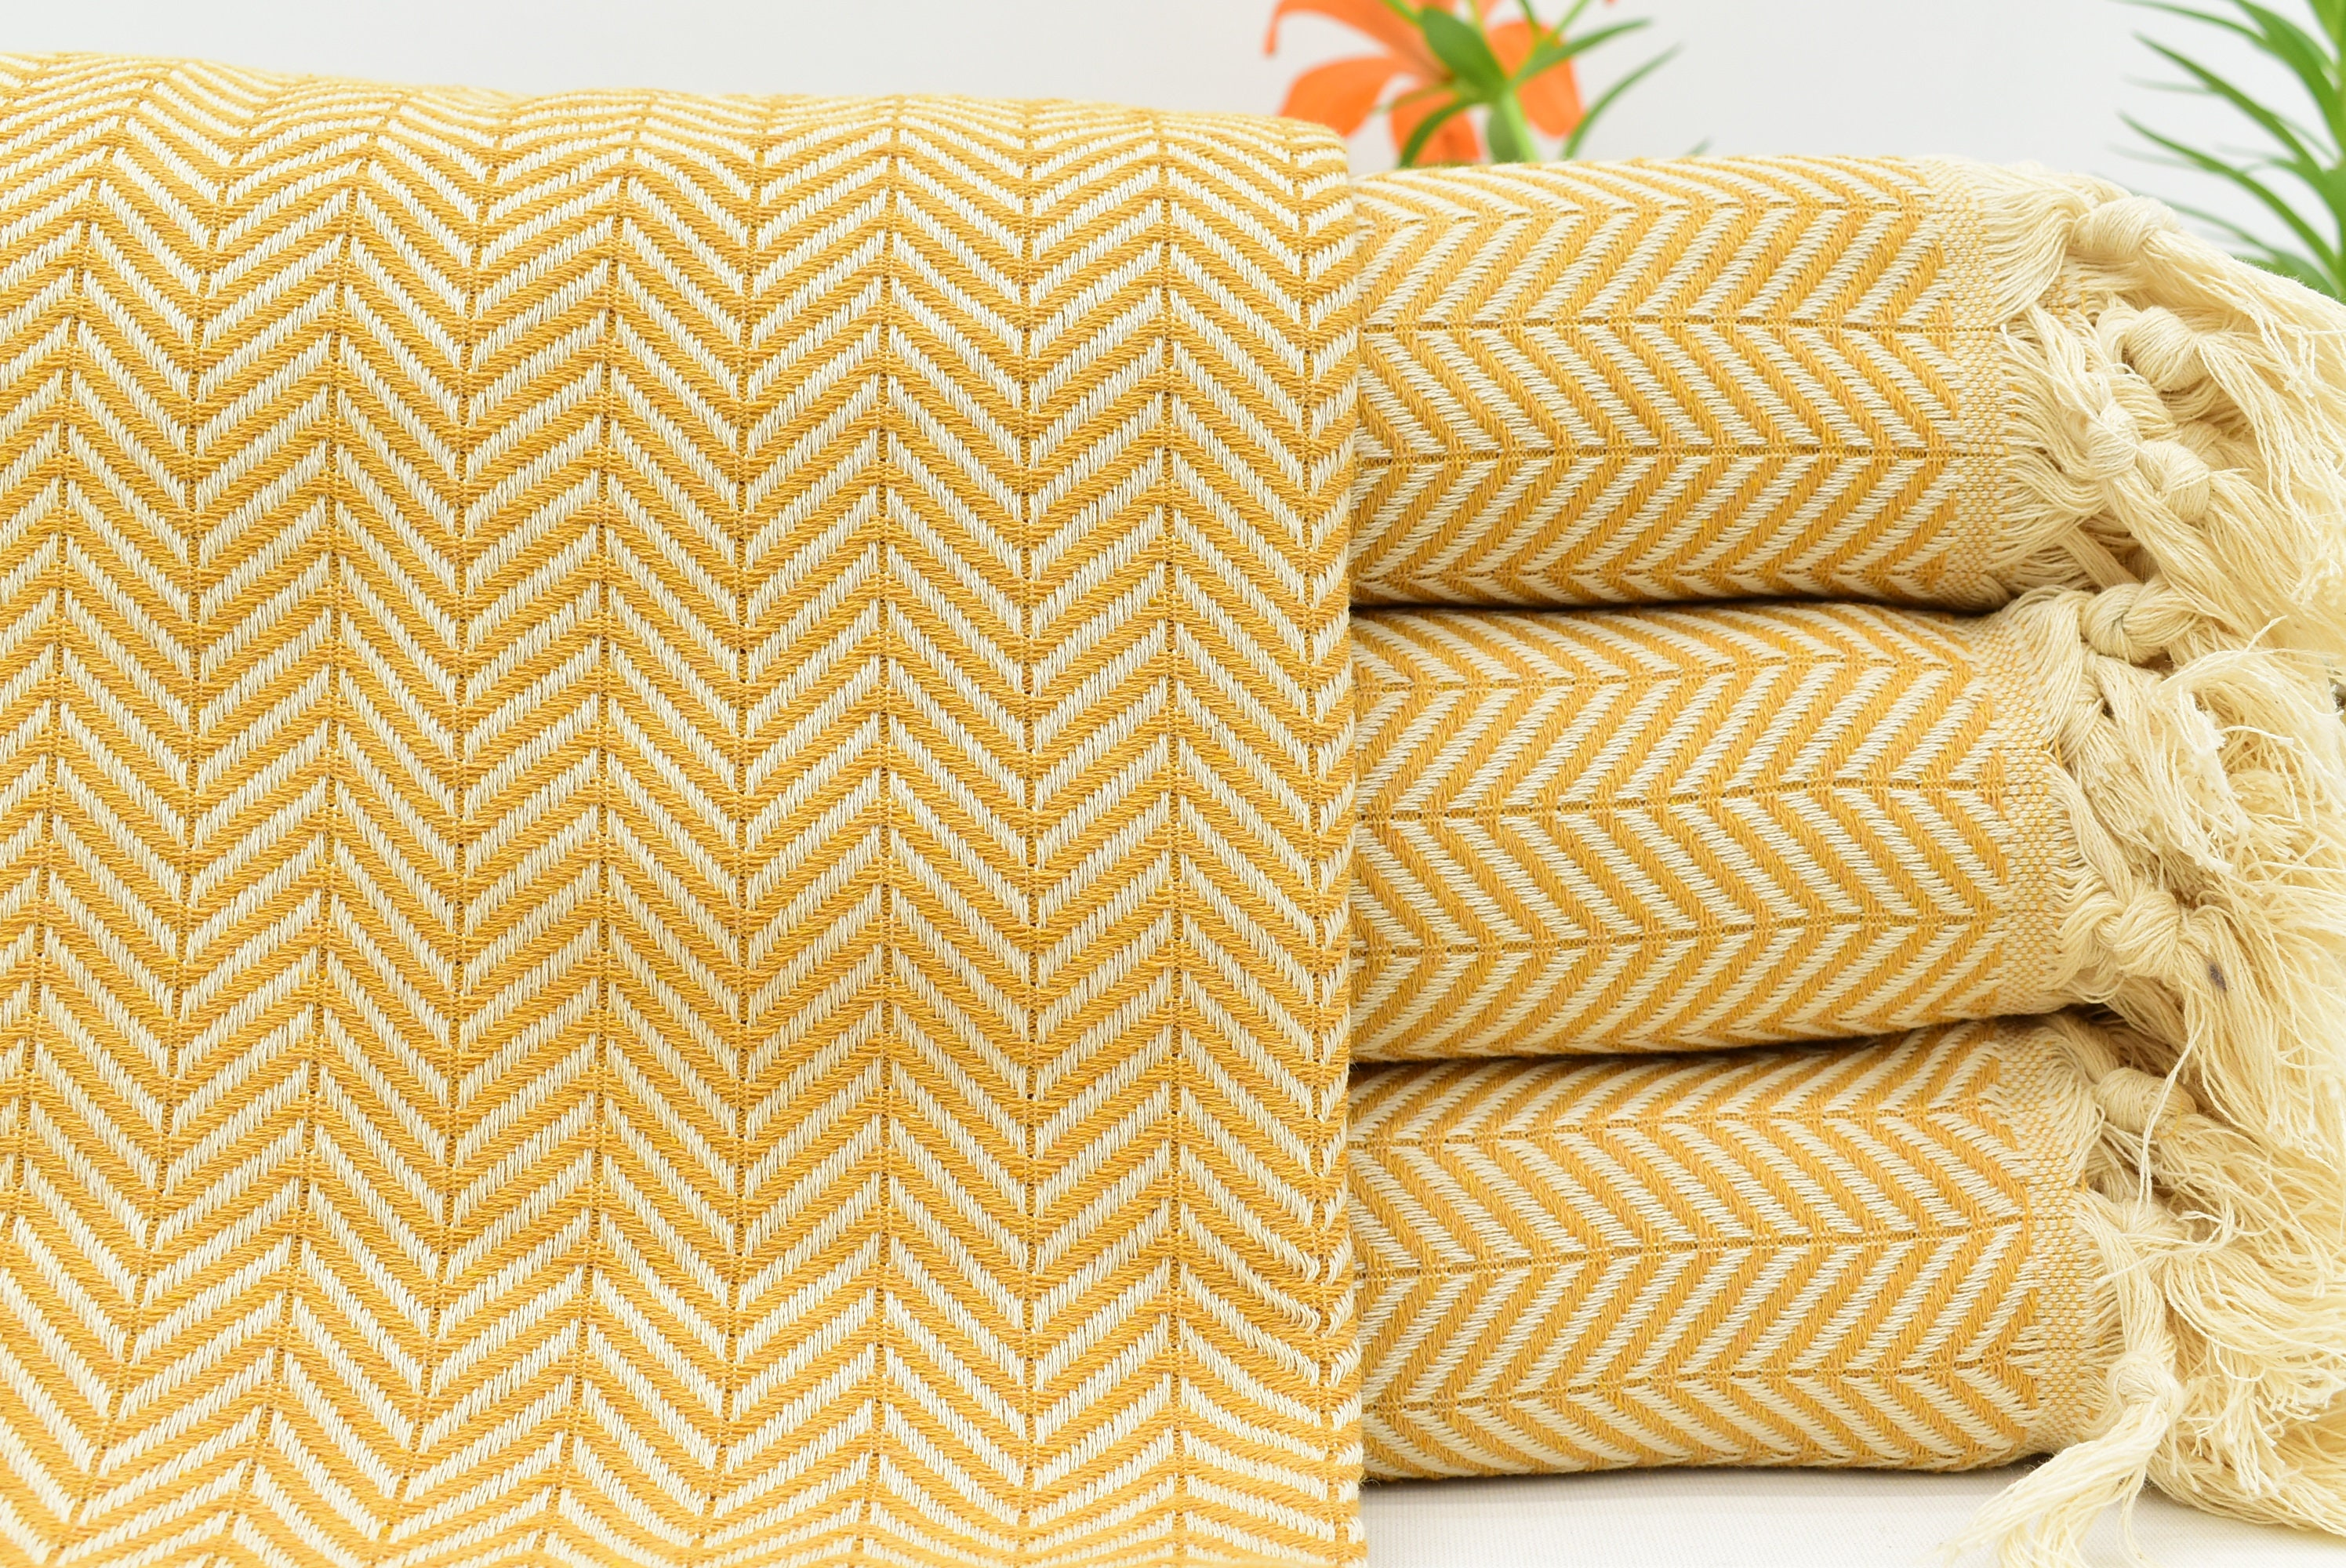 Yellow Blanket, Turkish Beach Blanket, Herringbone Blanket, Mustard  Blanket, Organic Blanket, Ultra Soft Blanket 79x90 Blanket Bct-Pk-Arrow